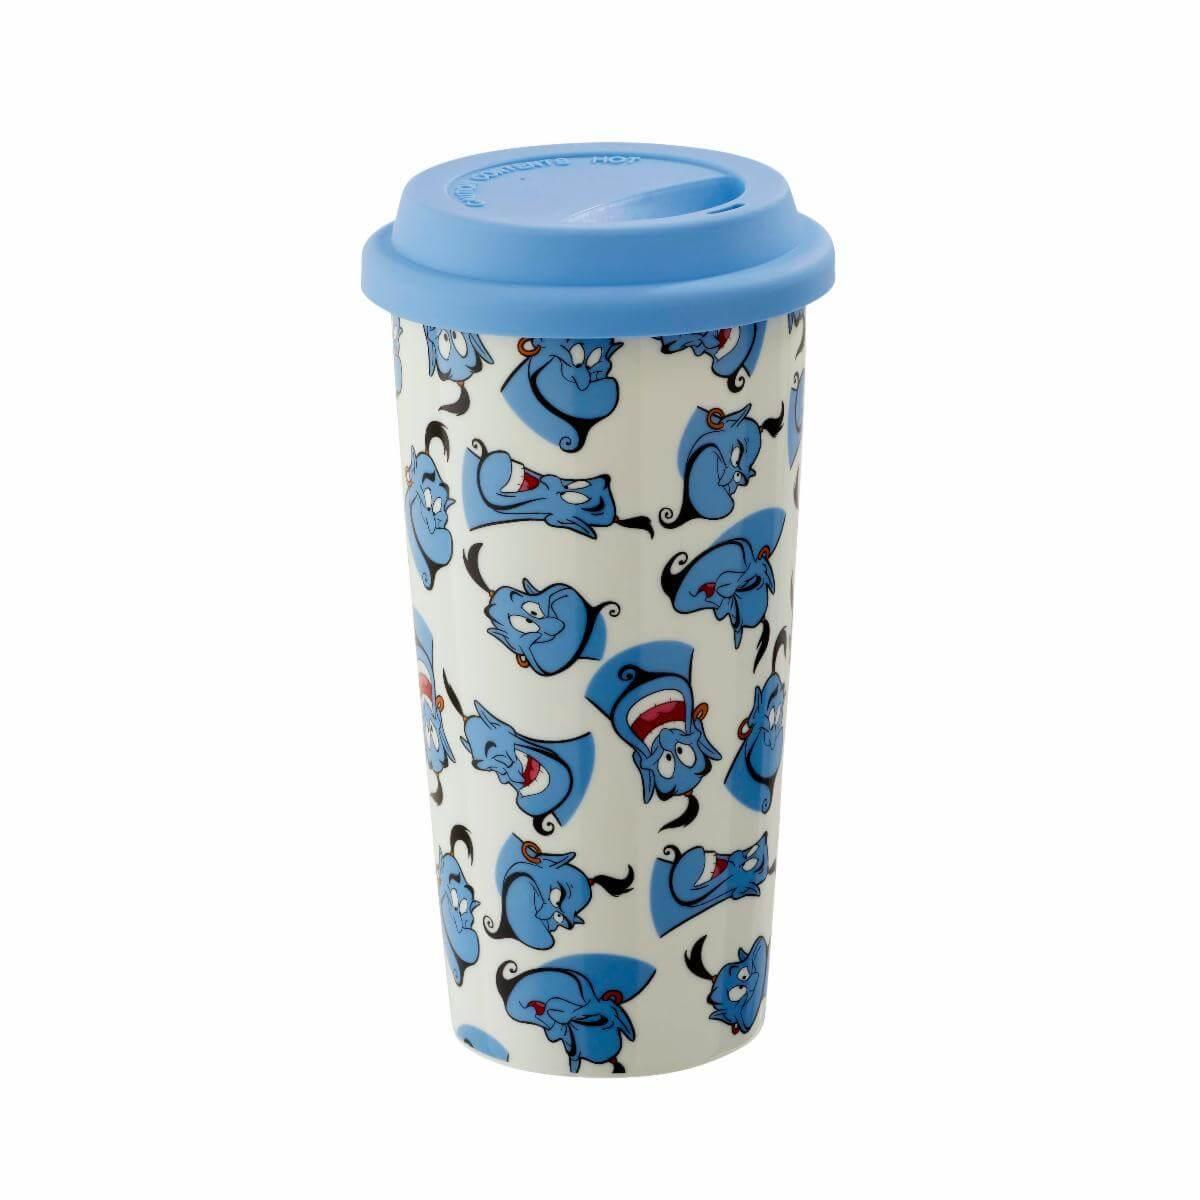 Image of Funko Homeware Disney Aladdin Genie Pattern Lidded Mug